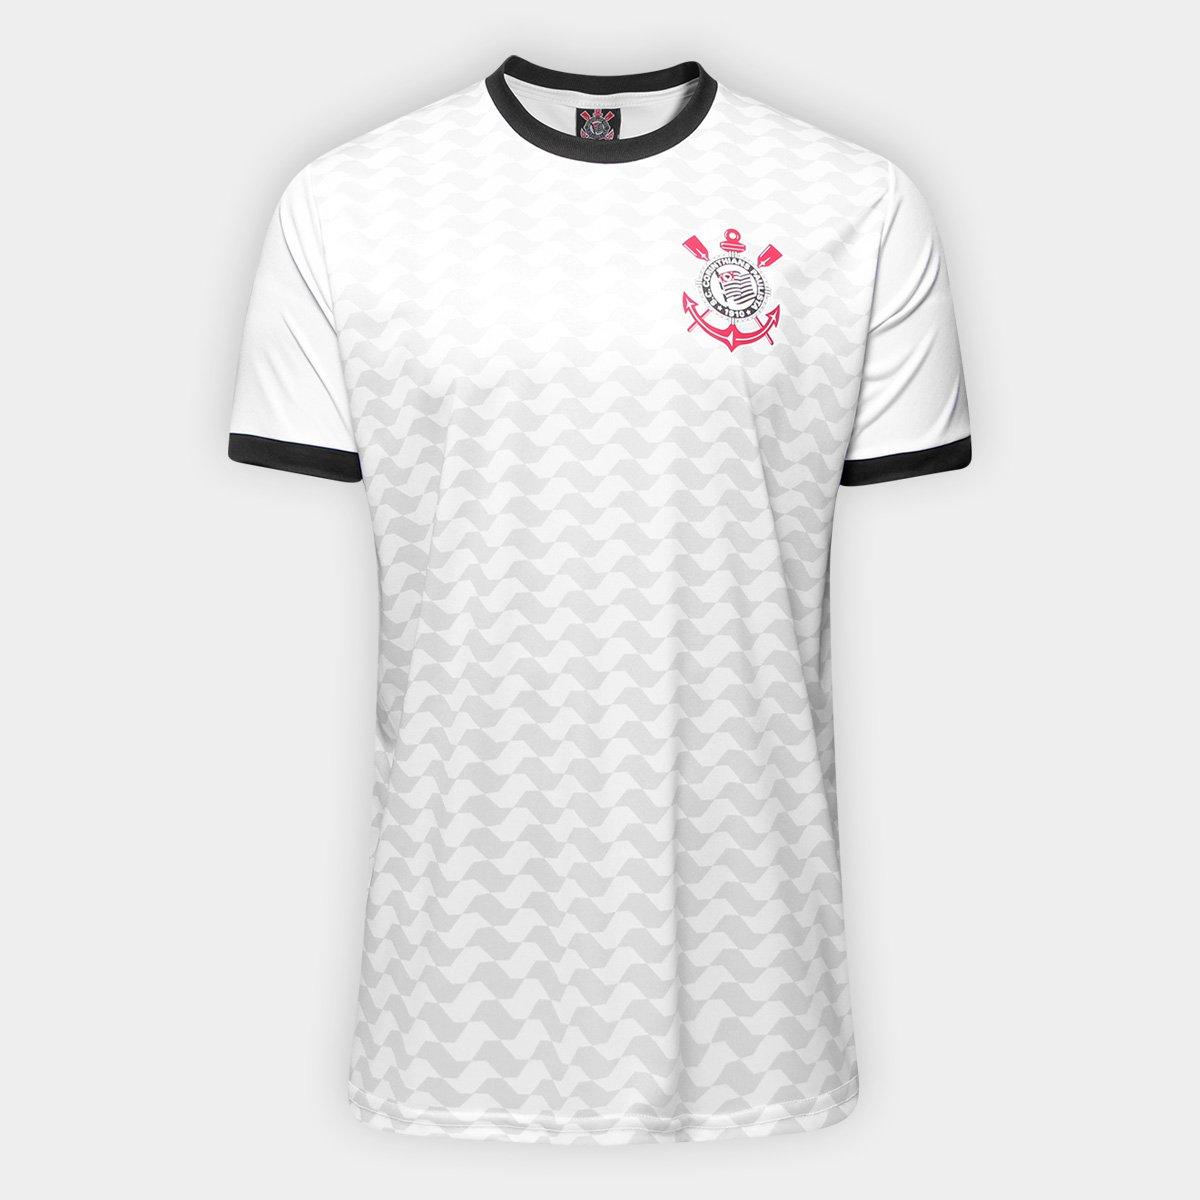 Camisa Corinthians Libertados Masculina a531ae35e1495